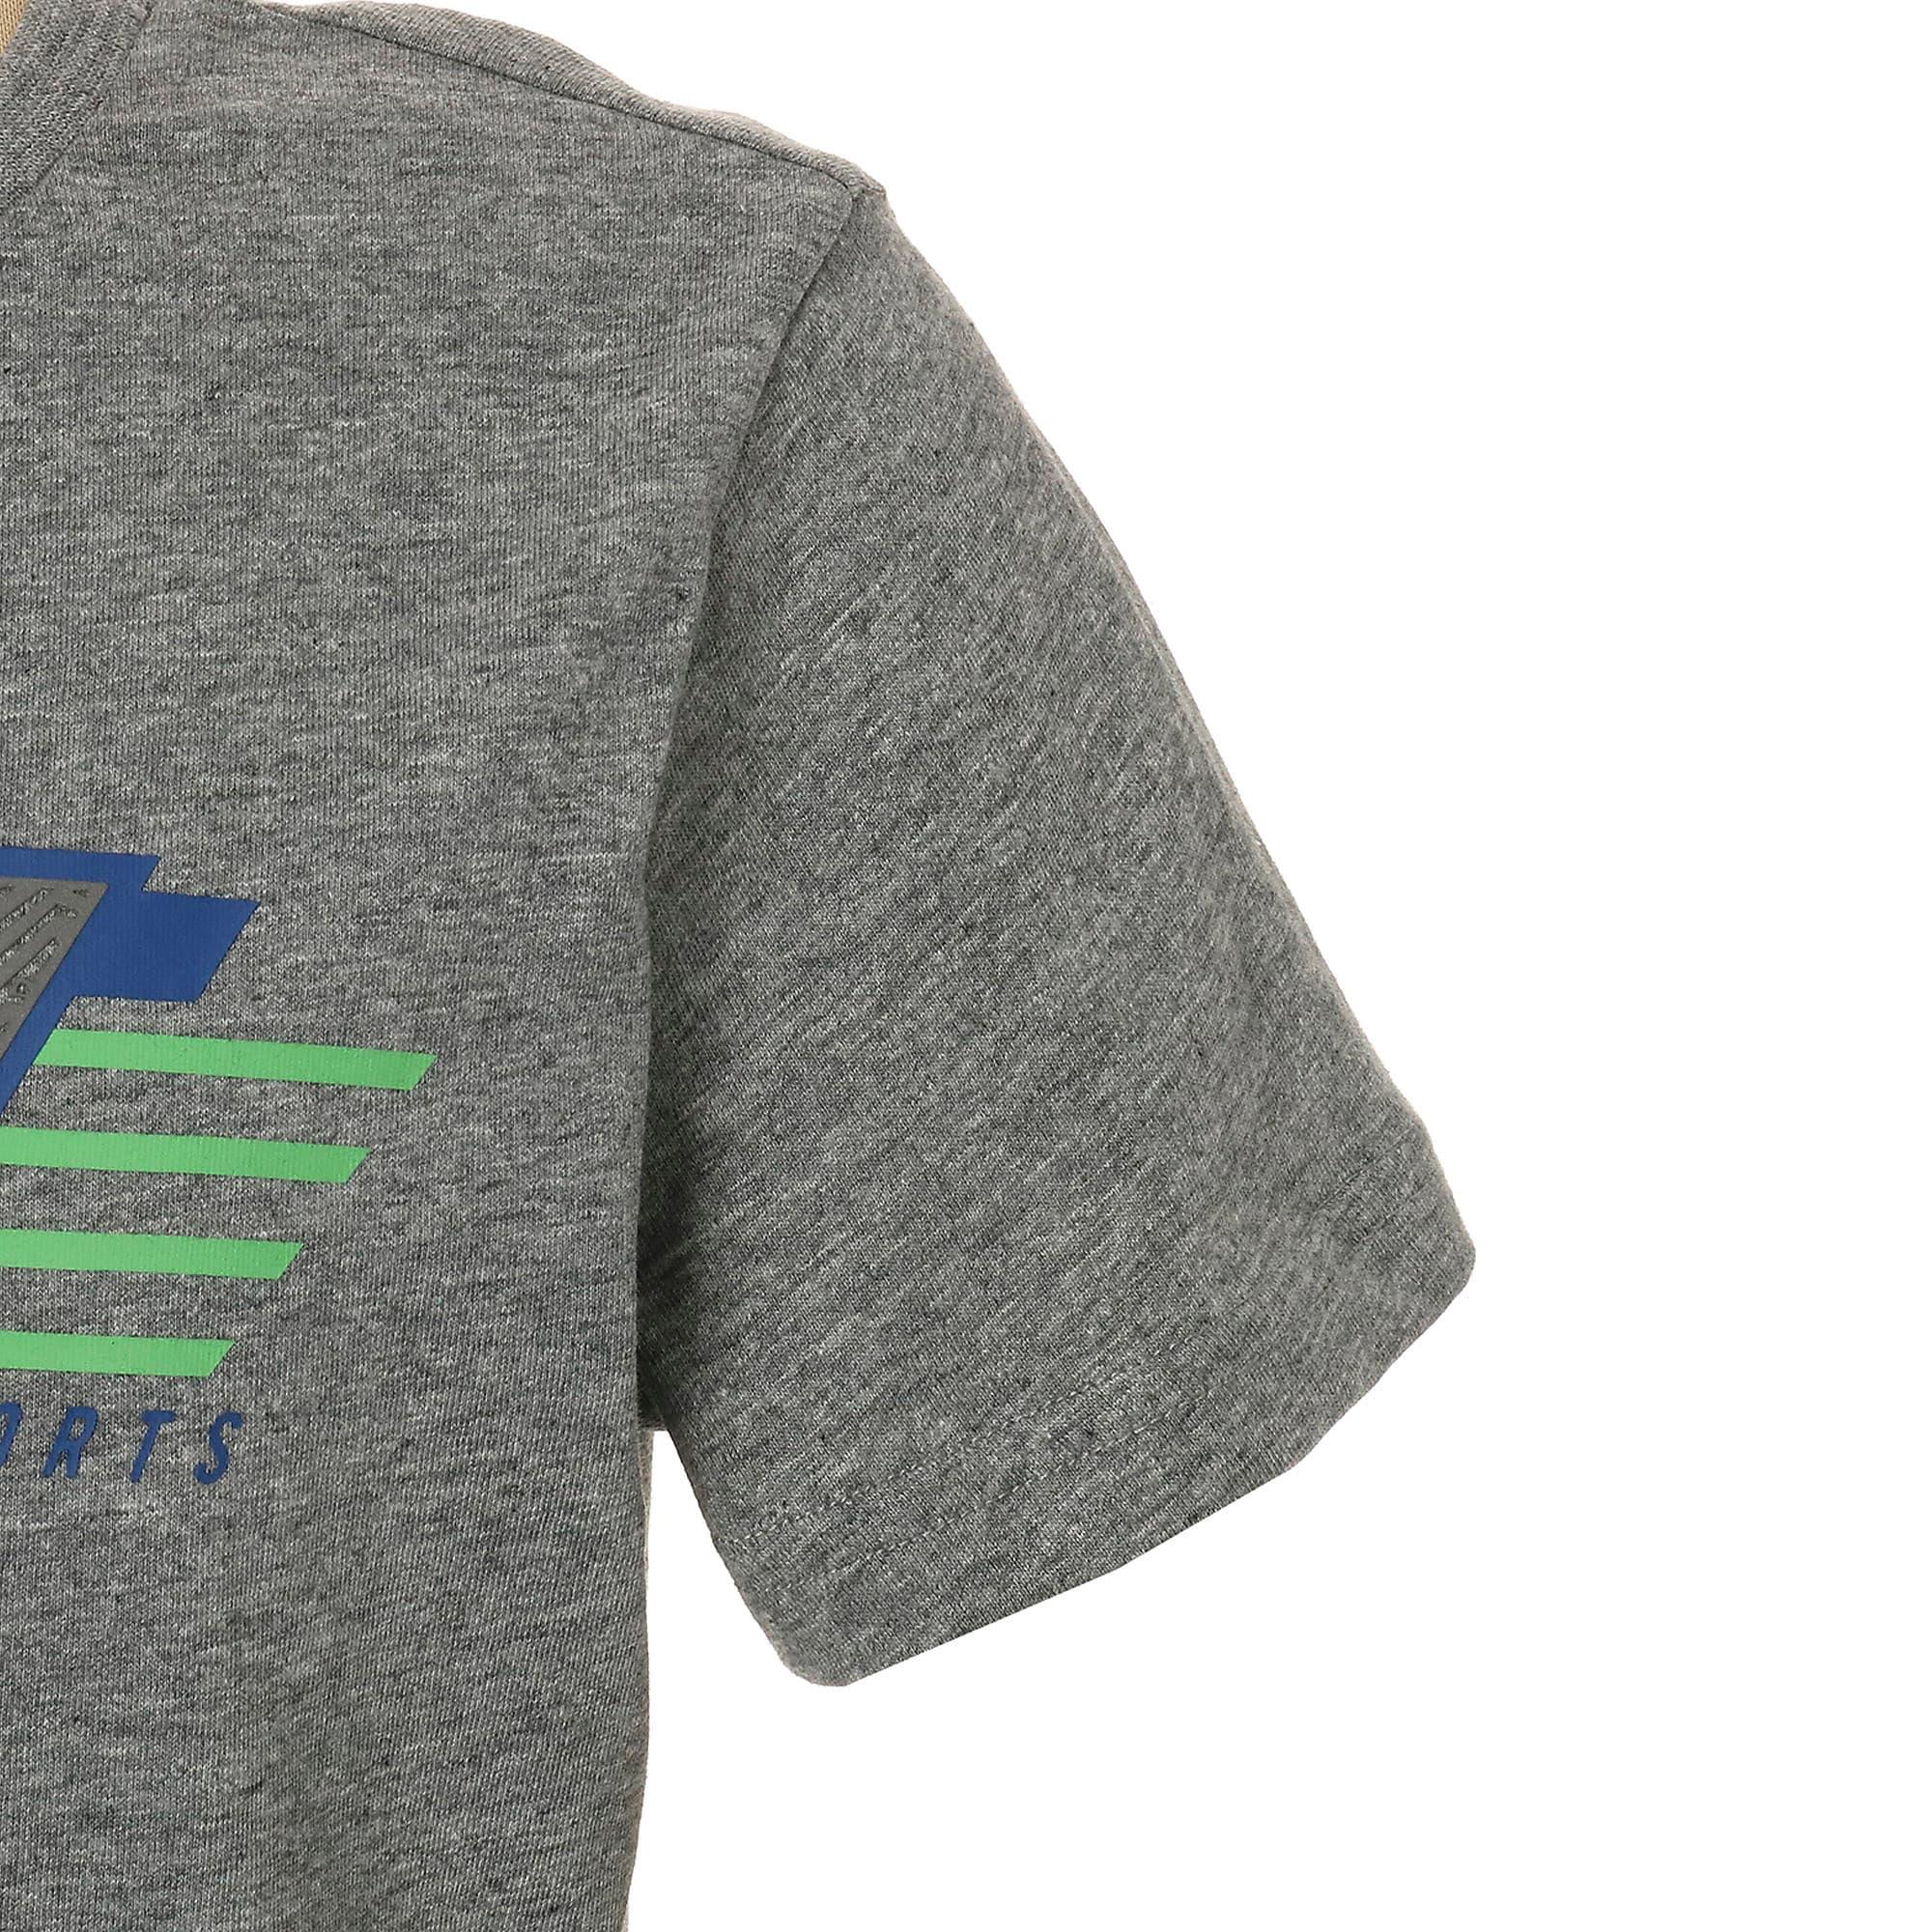 Thumbnail 5 of キッズ ALPHA SS グラフィック Tシャツ 半袖, Medium Gray Heather, medium-JPN